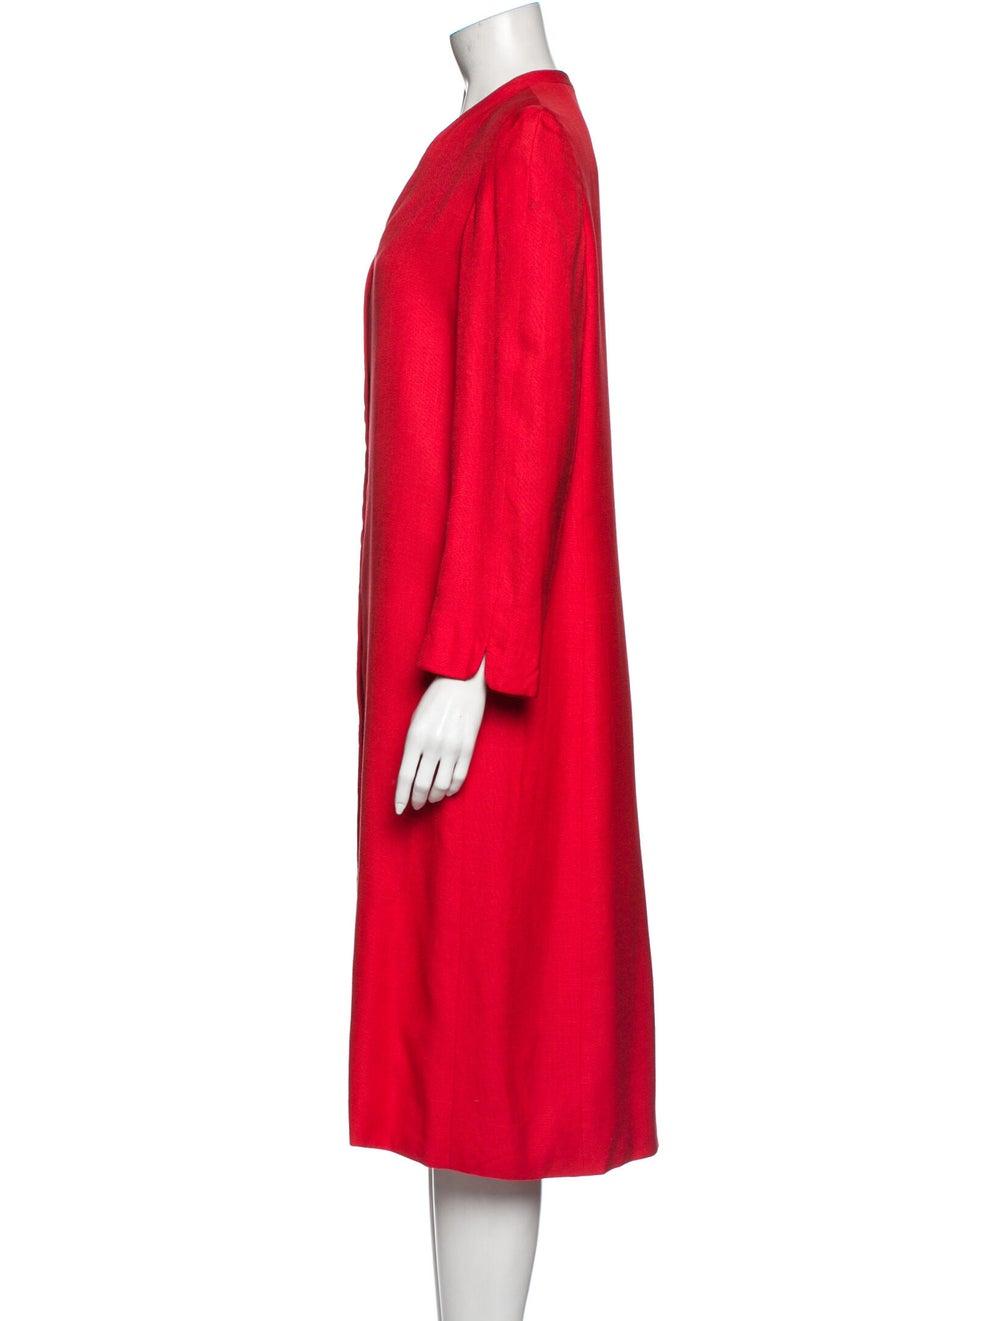 Halston Vintage Midi Length Dress Red - image 2